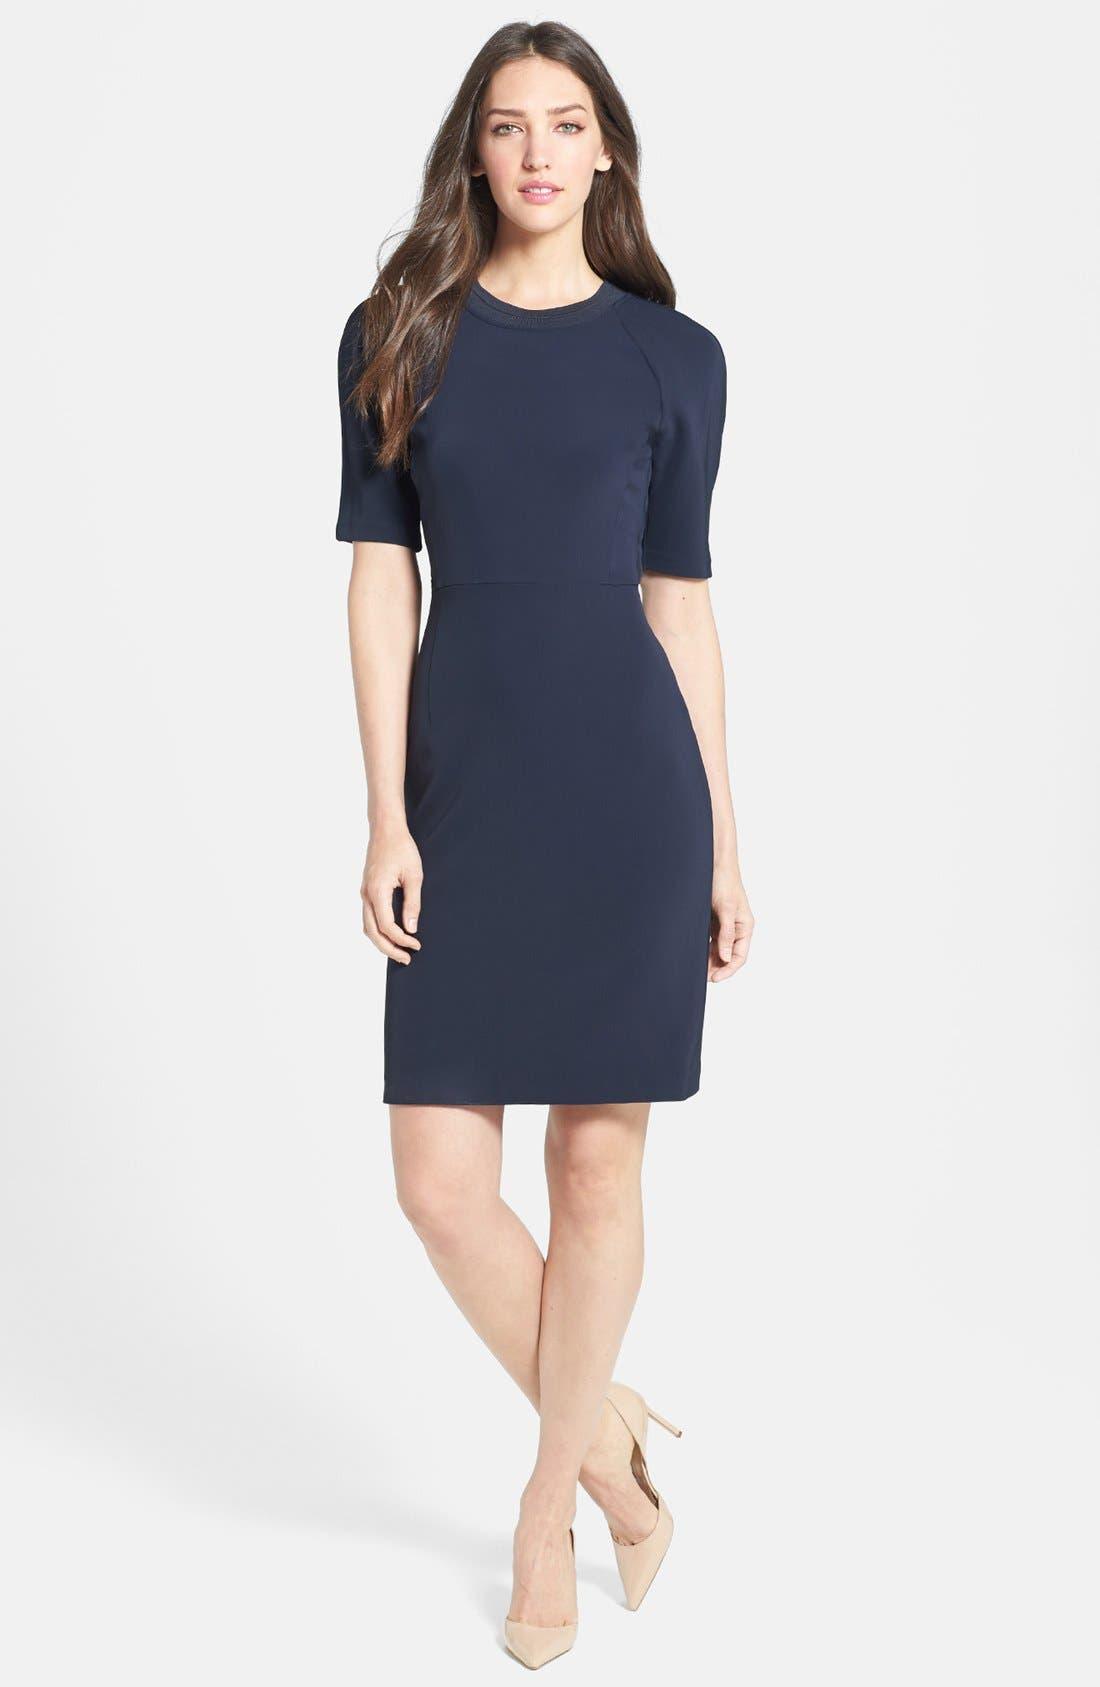 Alternate Image 1 Selected - Theory 'Tolland W.' Jersey Sheath Dress